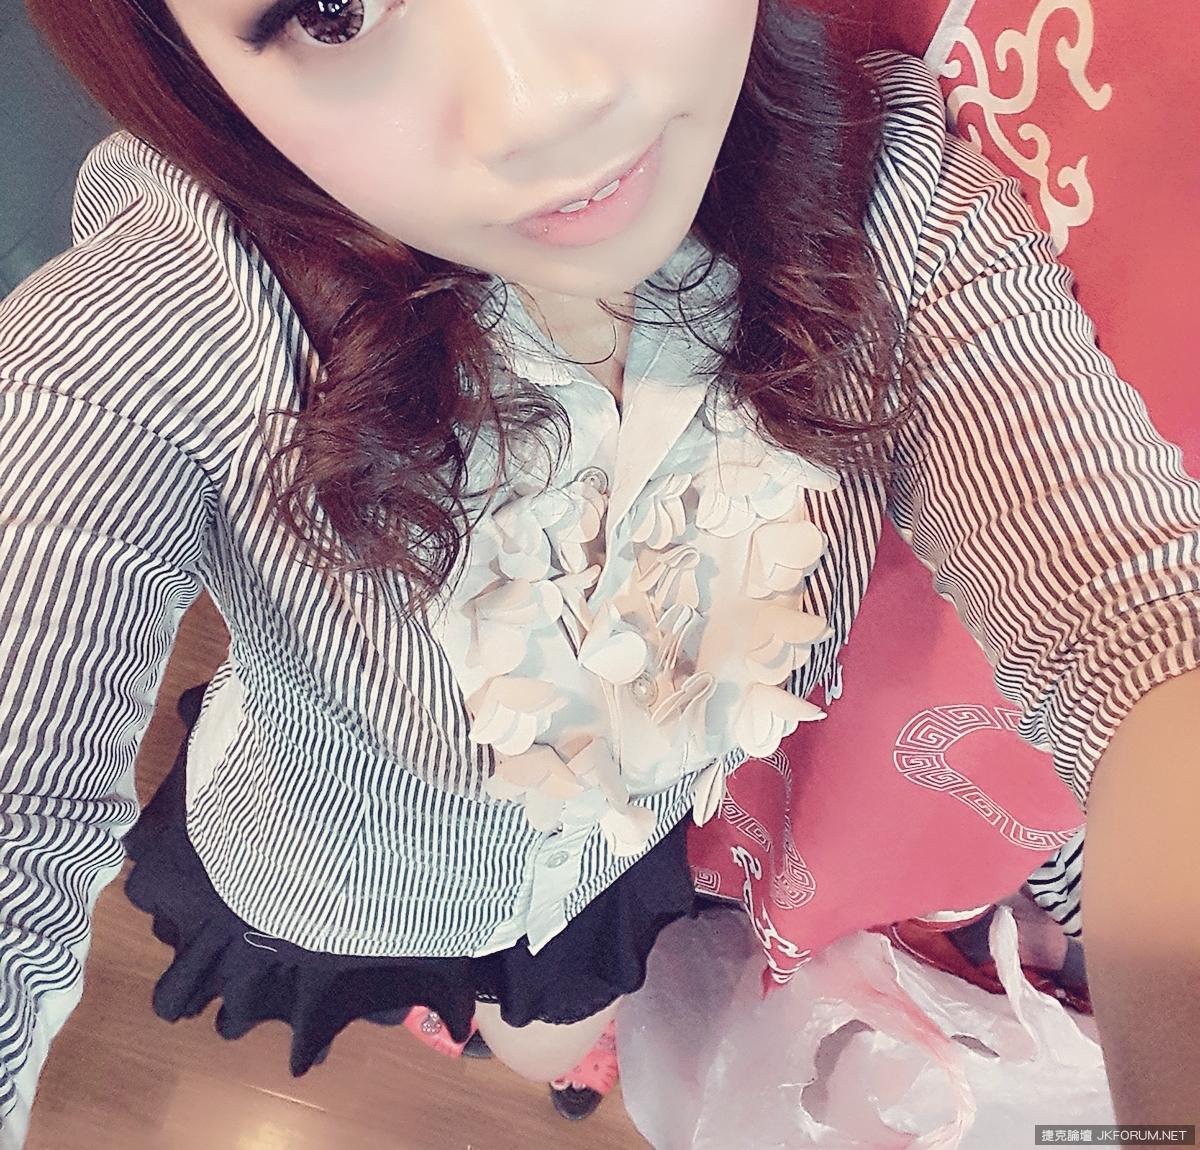 MYXJ_20160812054605_save.jpg